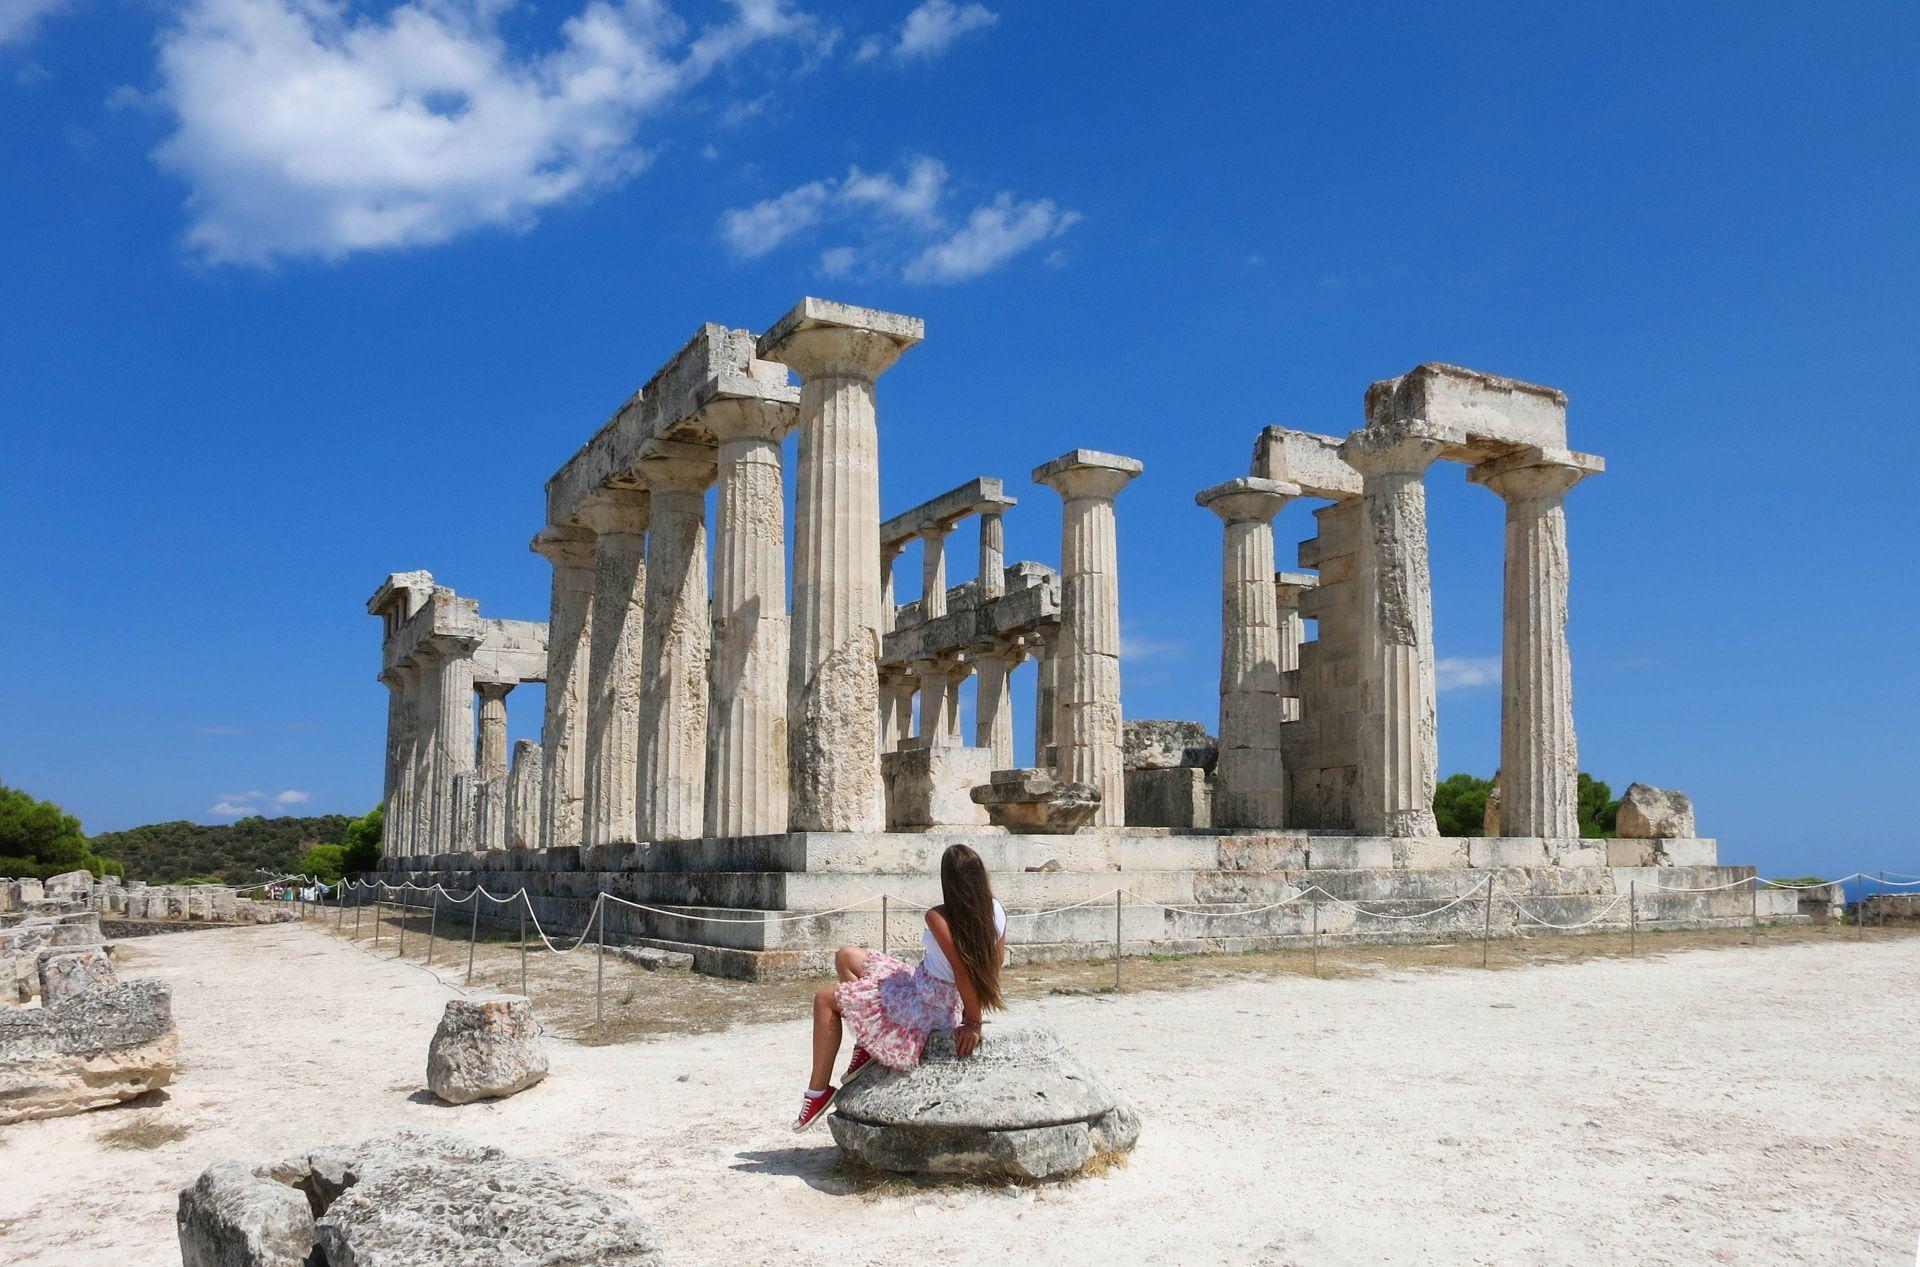 AA (11 hours): [Athens] Enchanting Aegina island